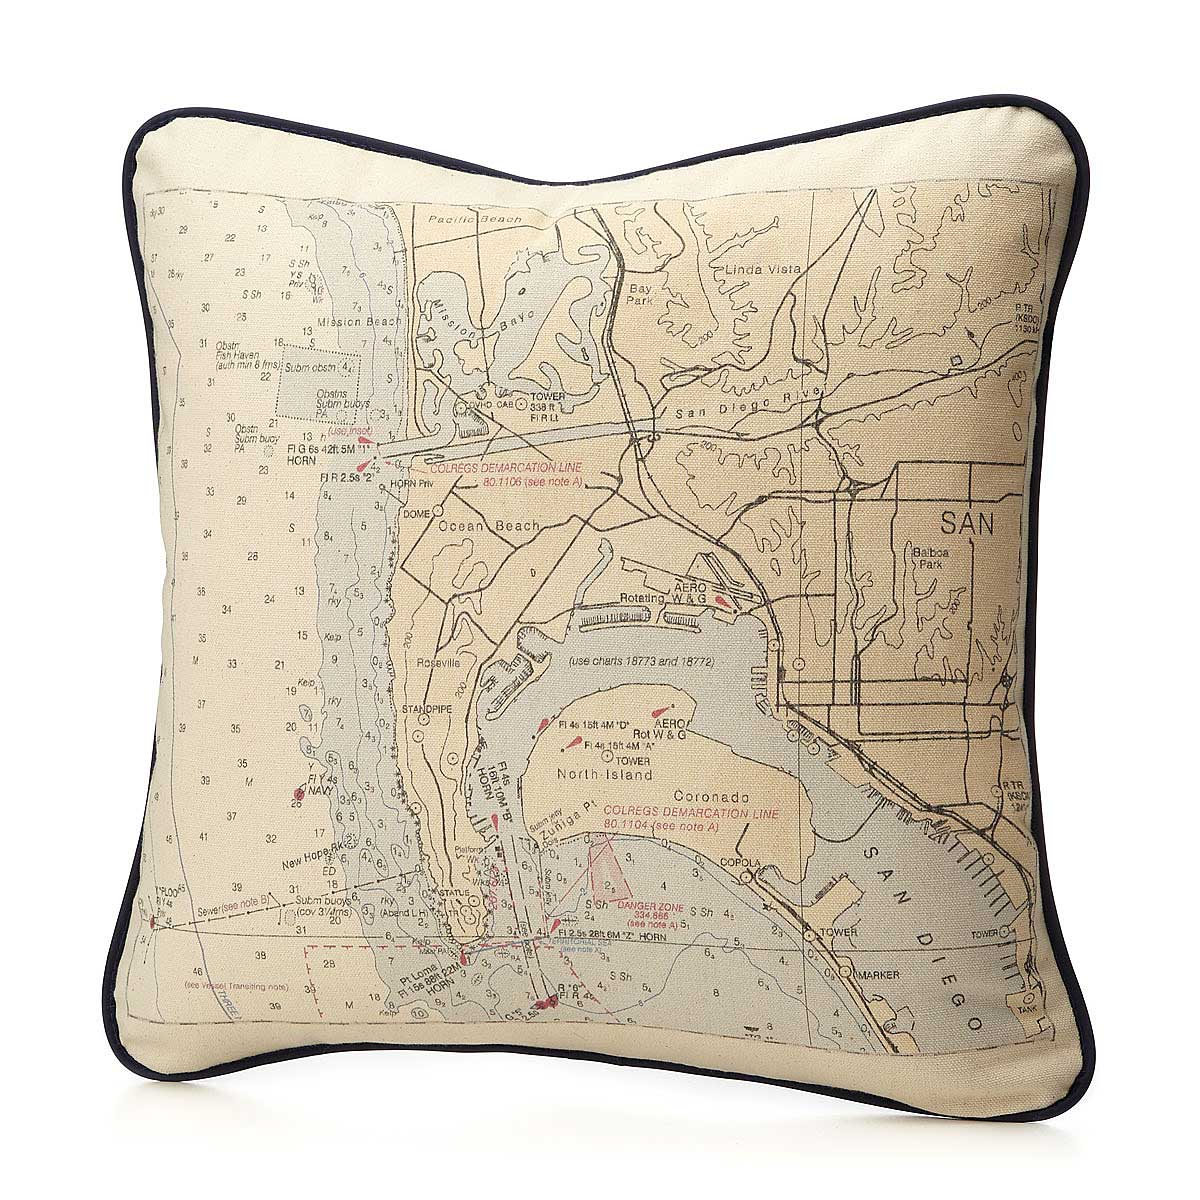 Custom Pillows Australia Custom Map Pillow  Personalized Map Cushion  Uncommongoods